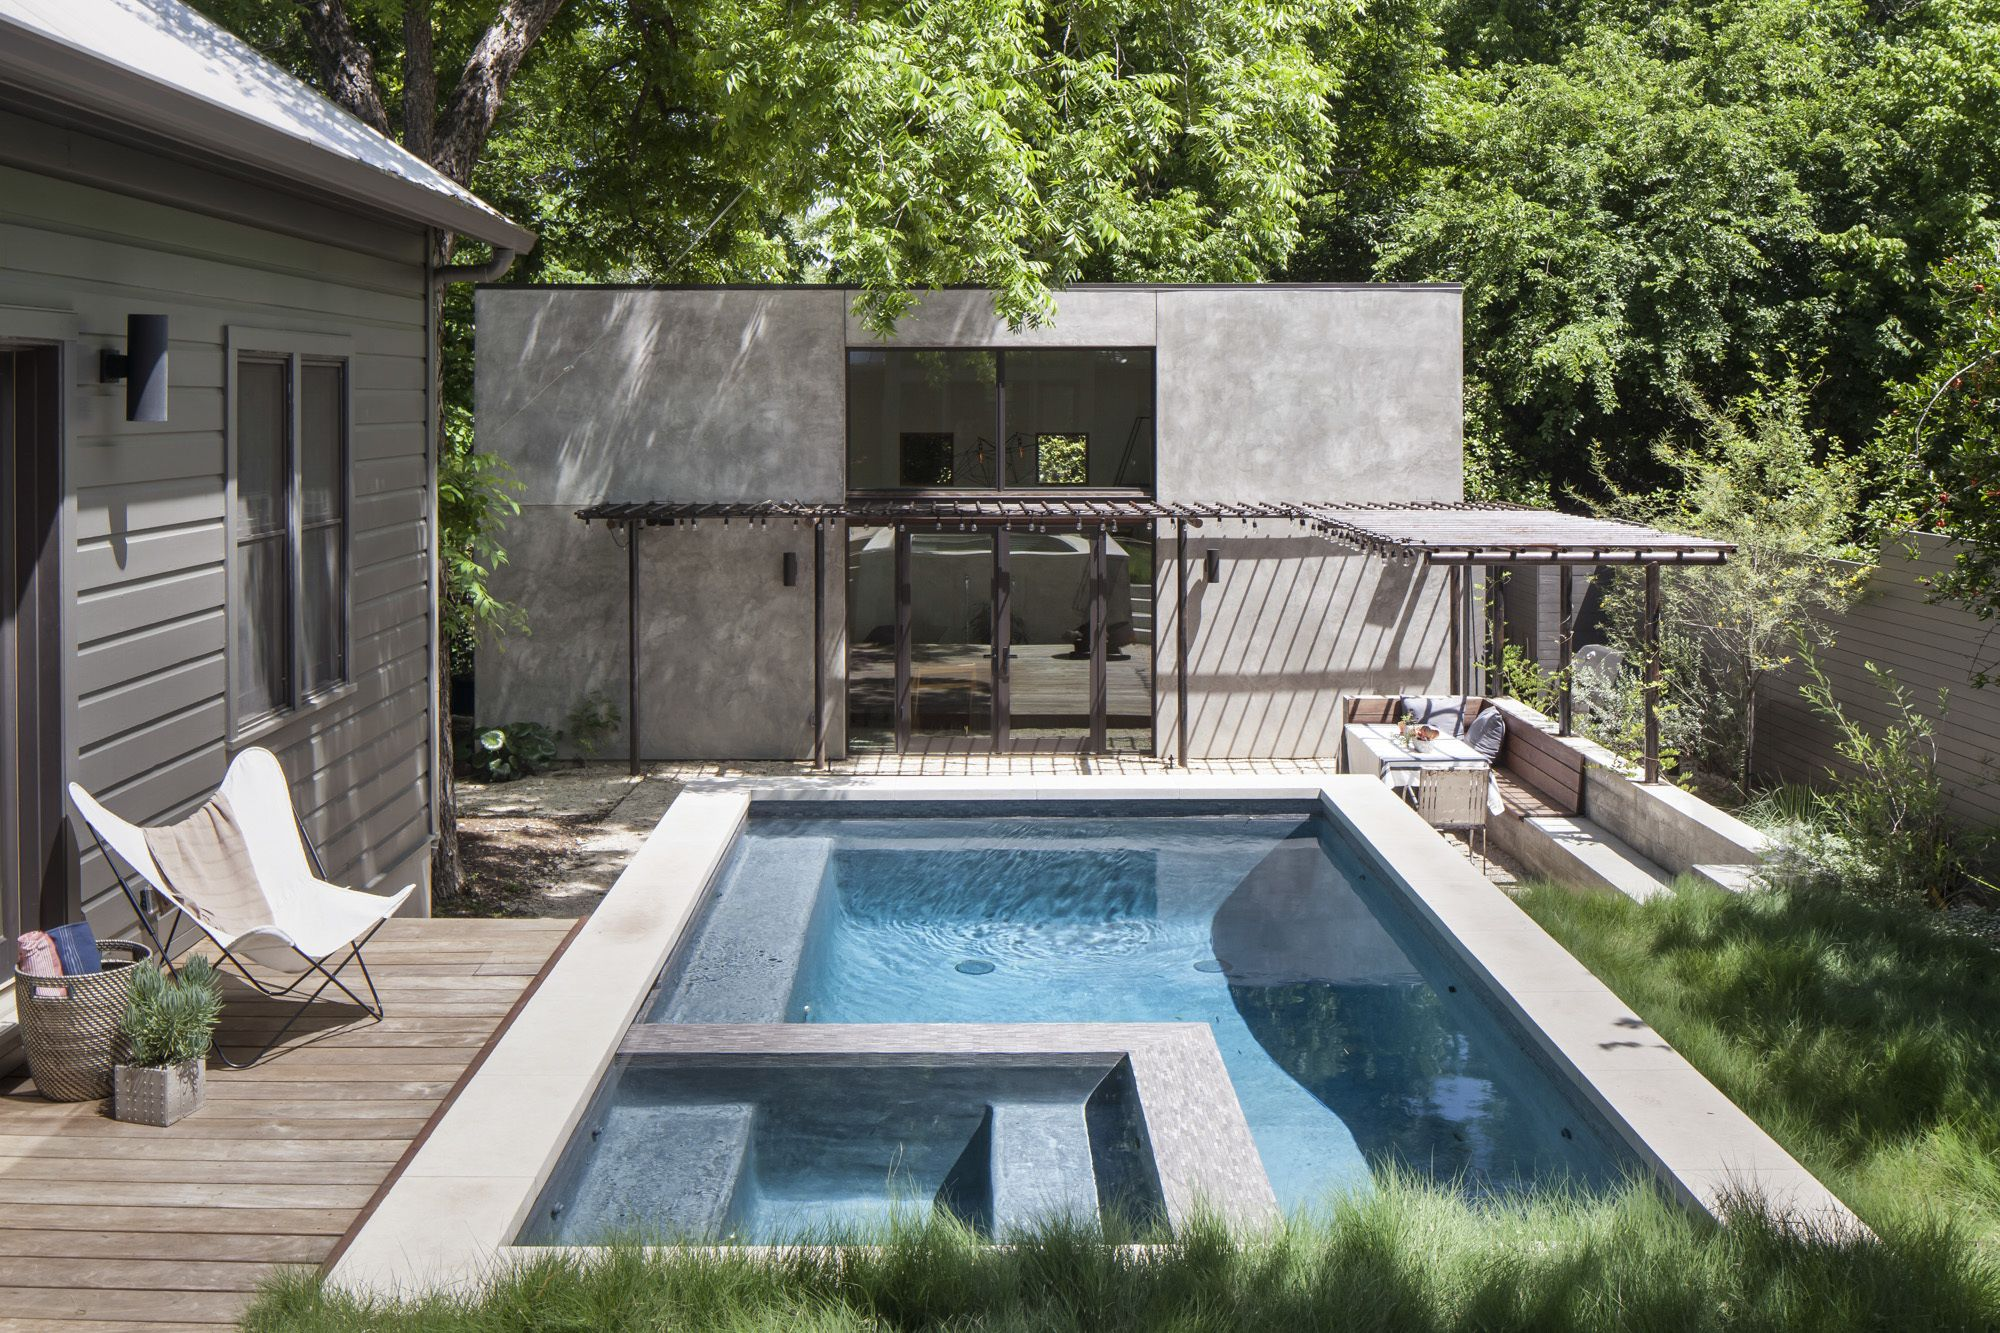 Garner Pool Casita Houses In Austin Backyard Small Backyard